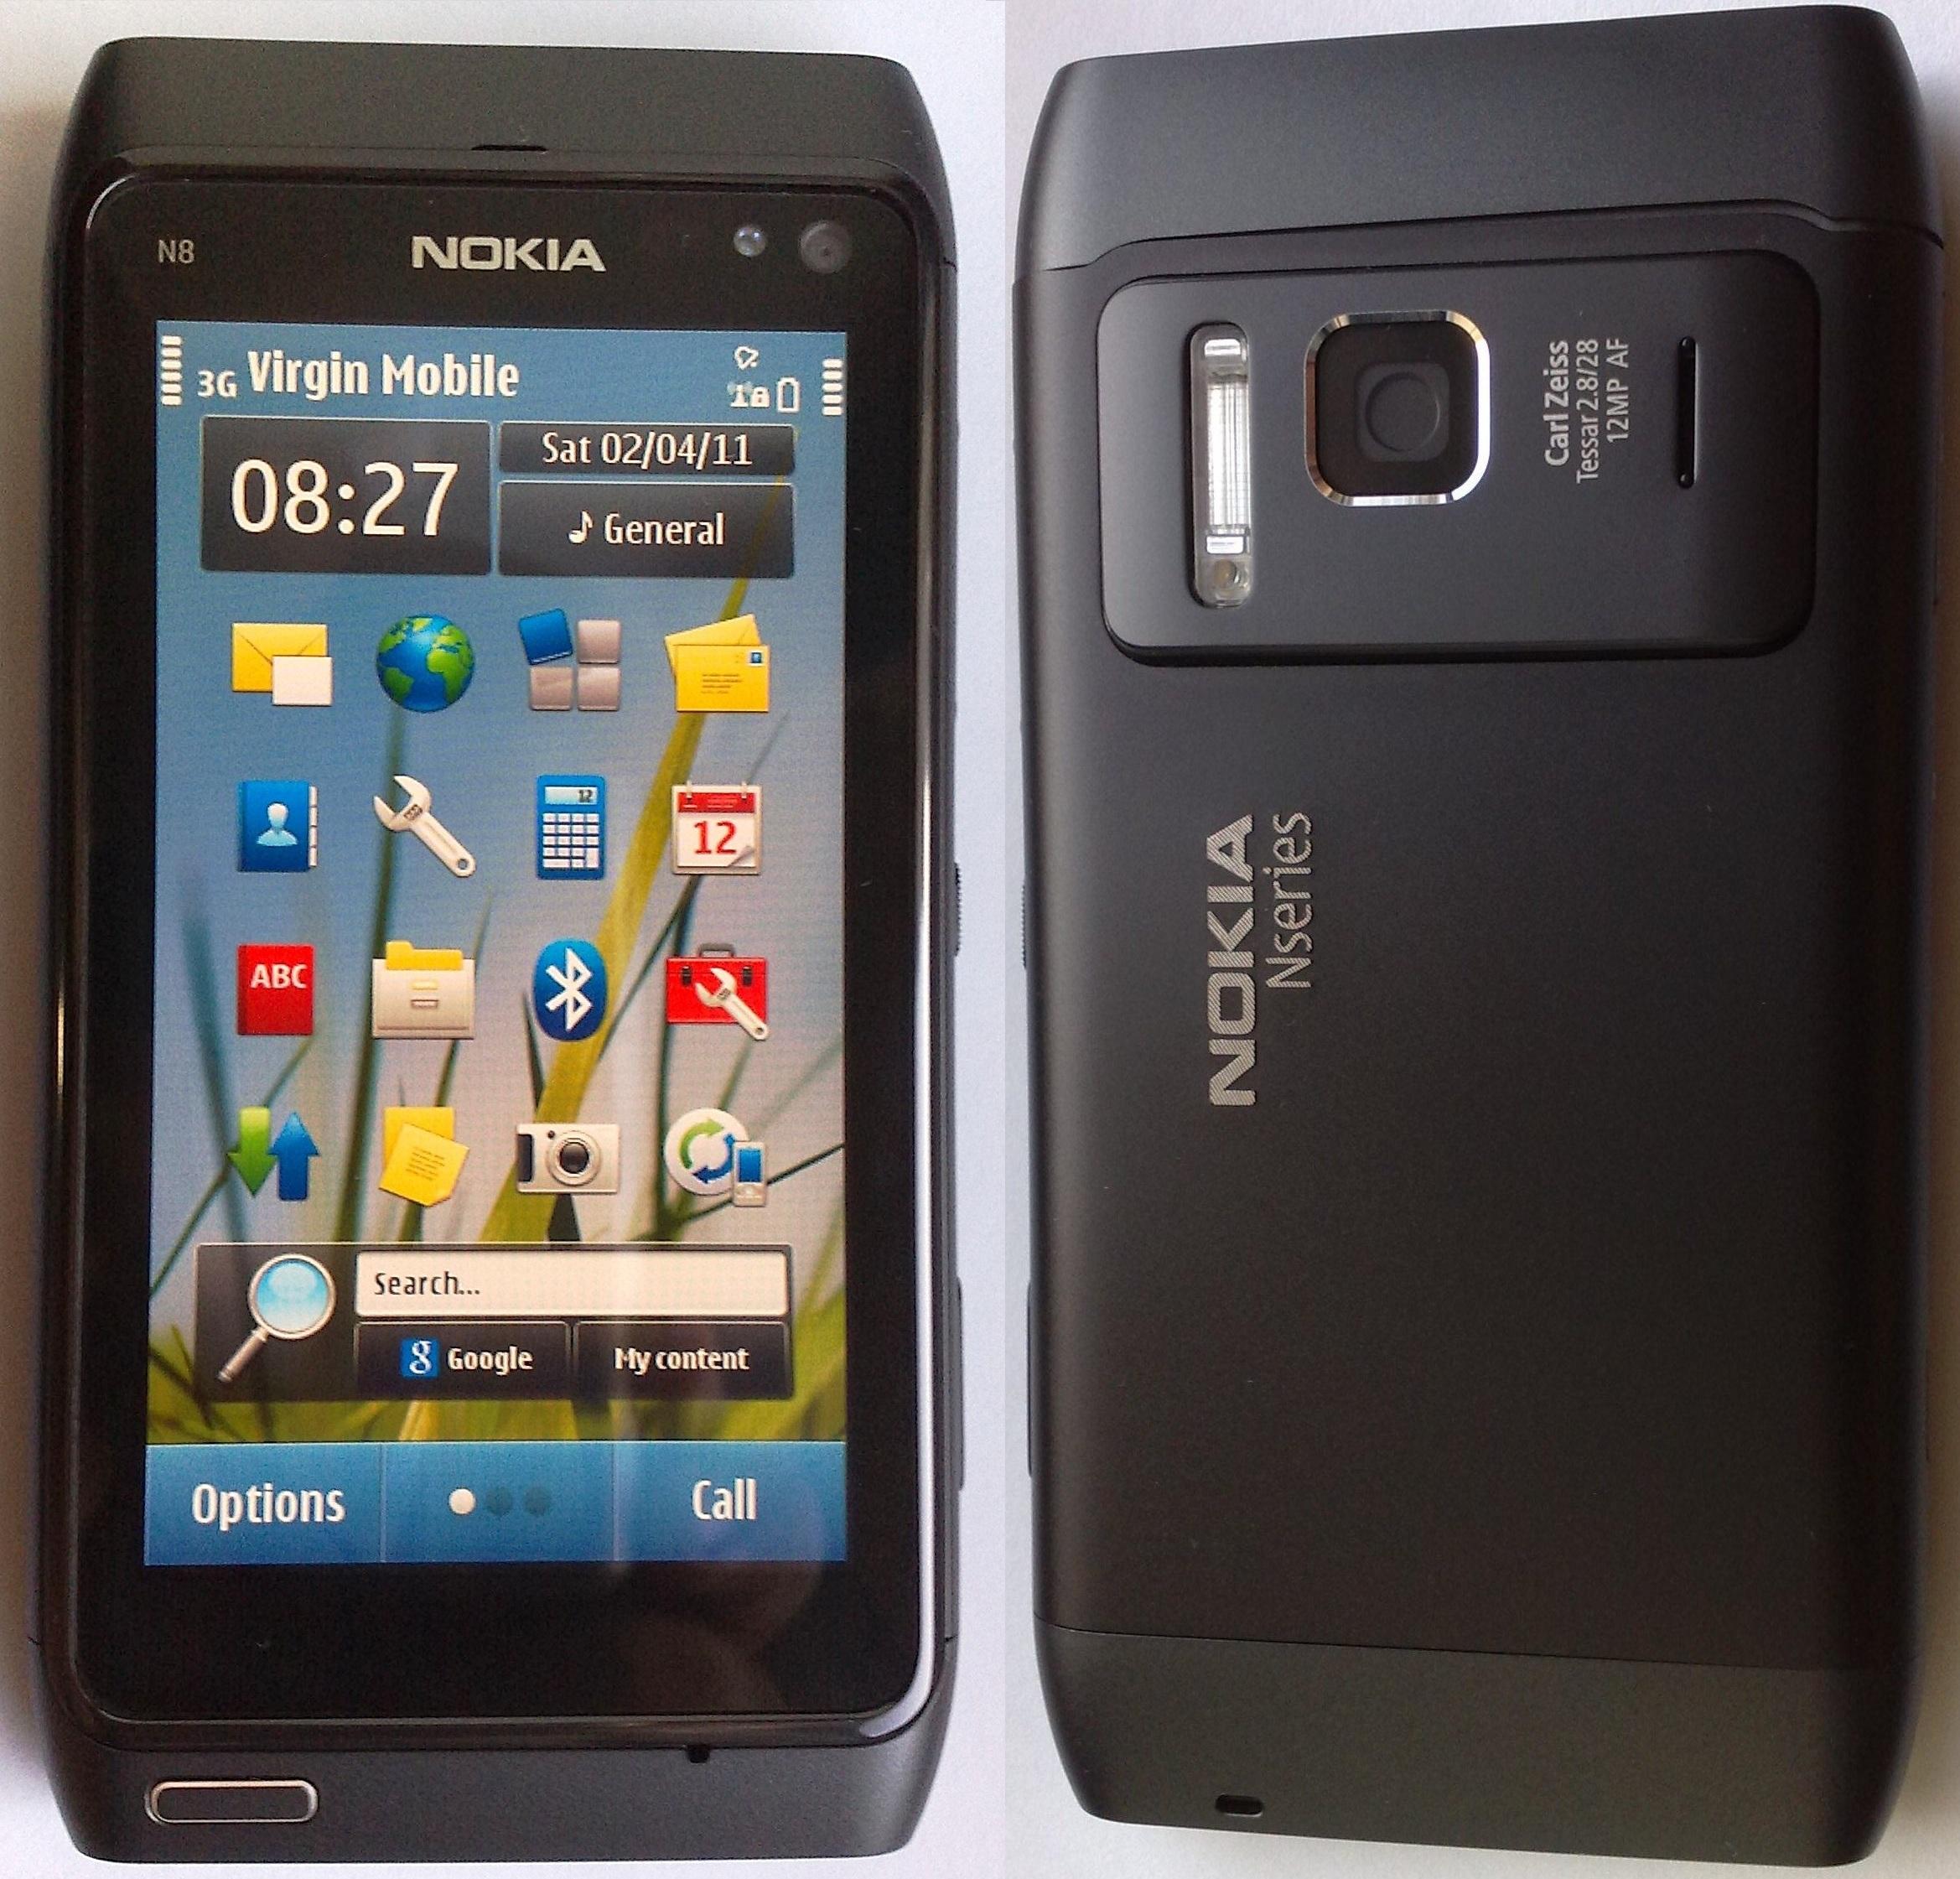 Nokia N8 16GB | R3199.00 | Cellular Phones | PriceCheck SA